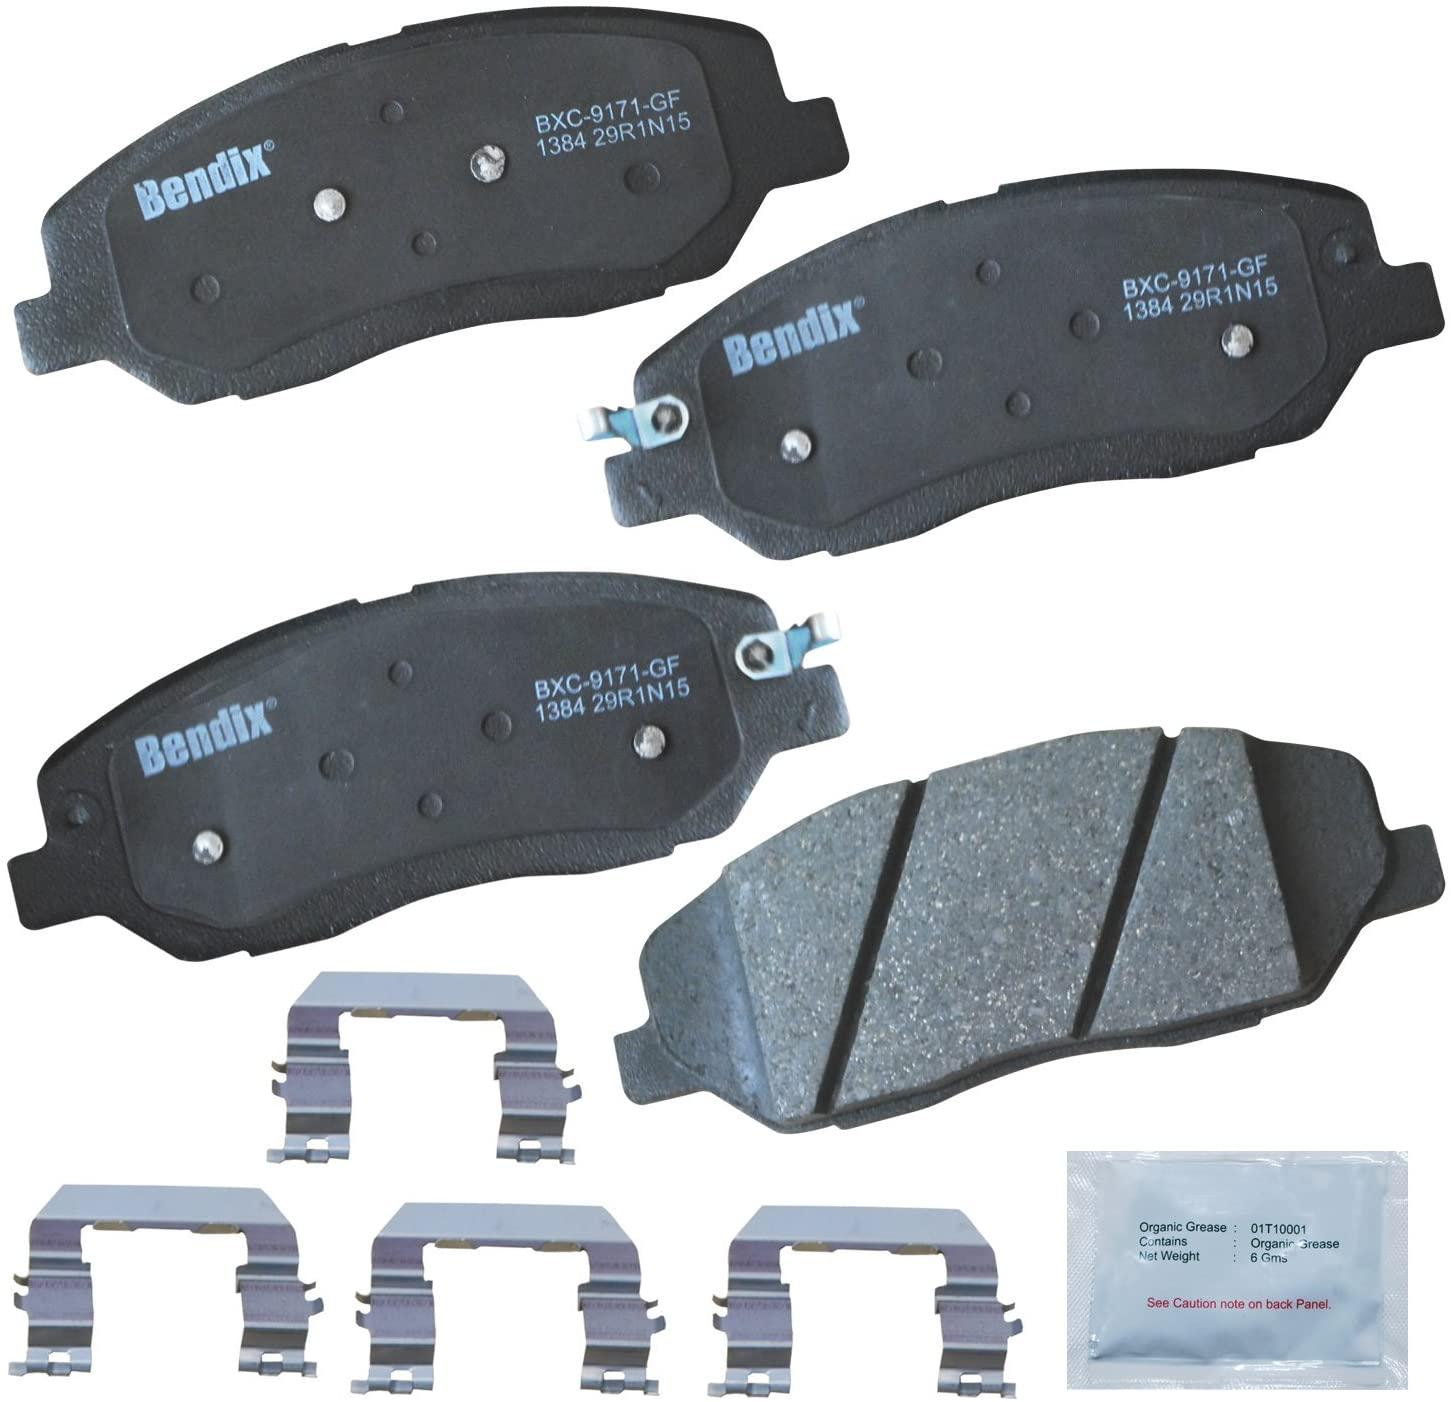 Bendix Premium Copper Free CFC1384 Ceramic Brake Pad (with Installation Hardware Front)